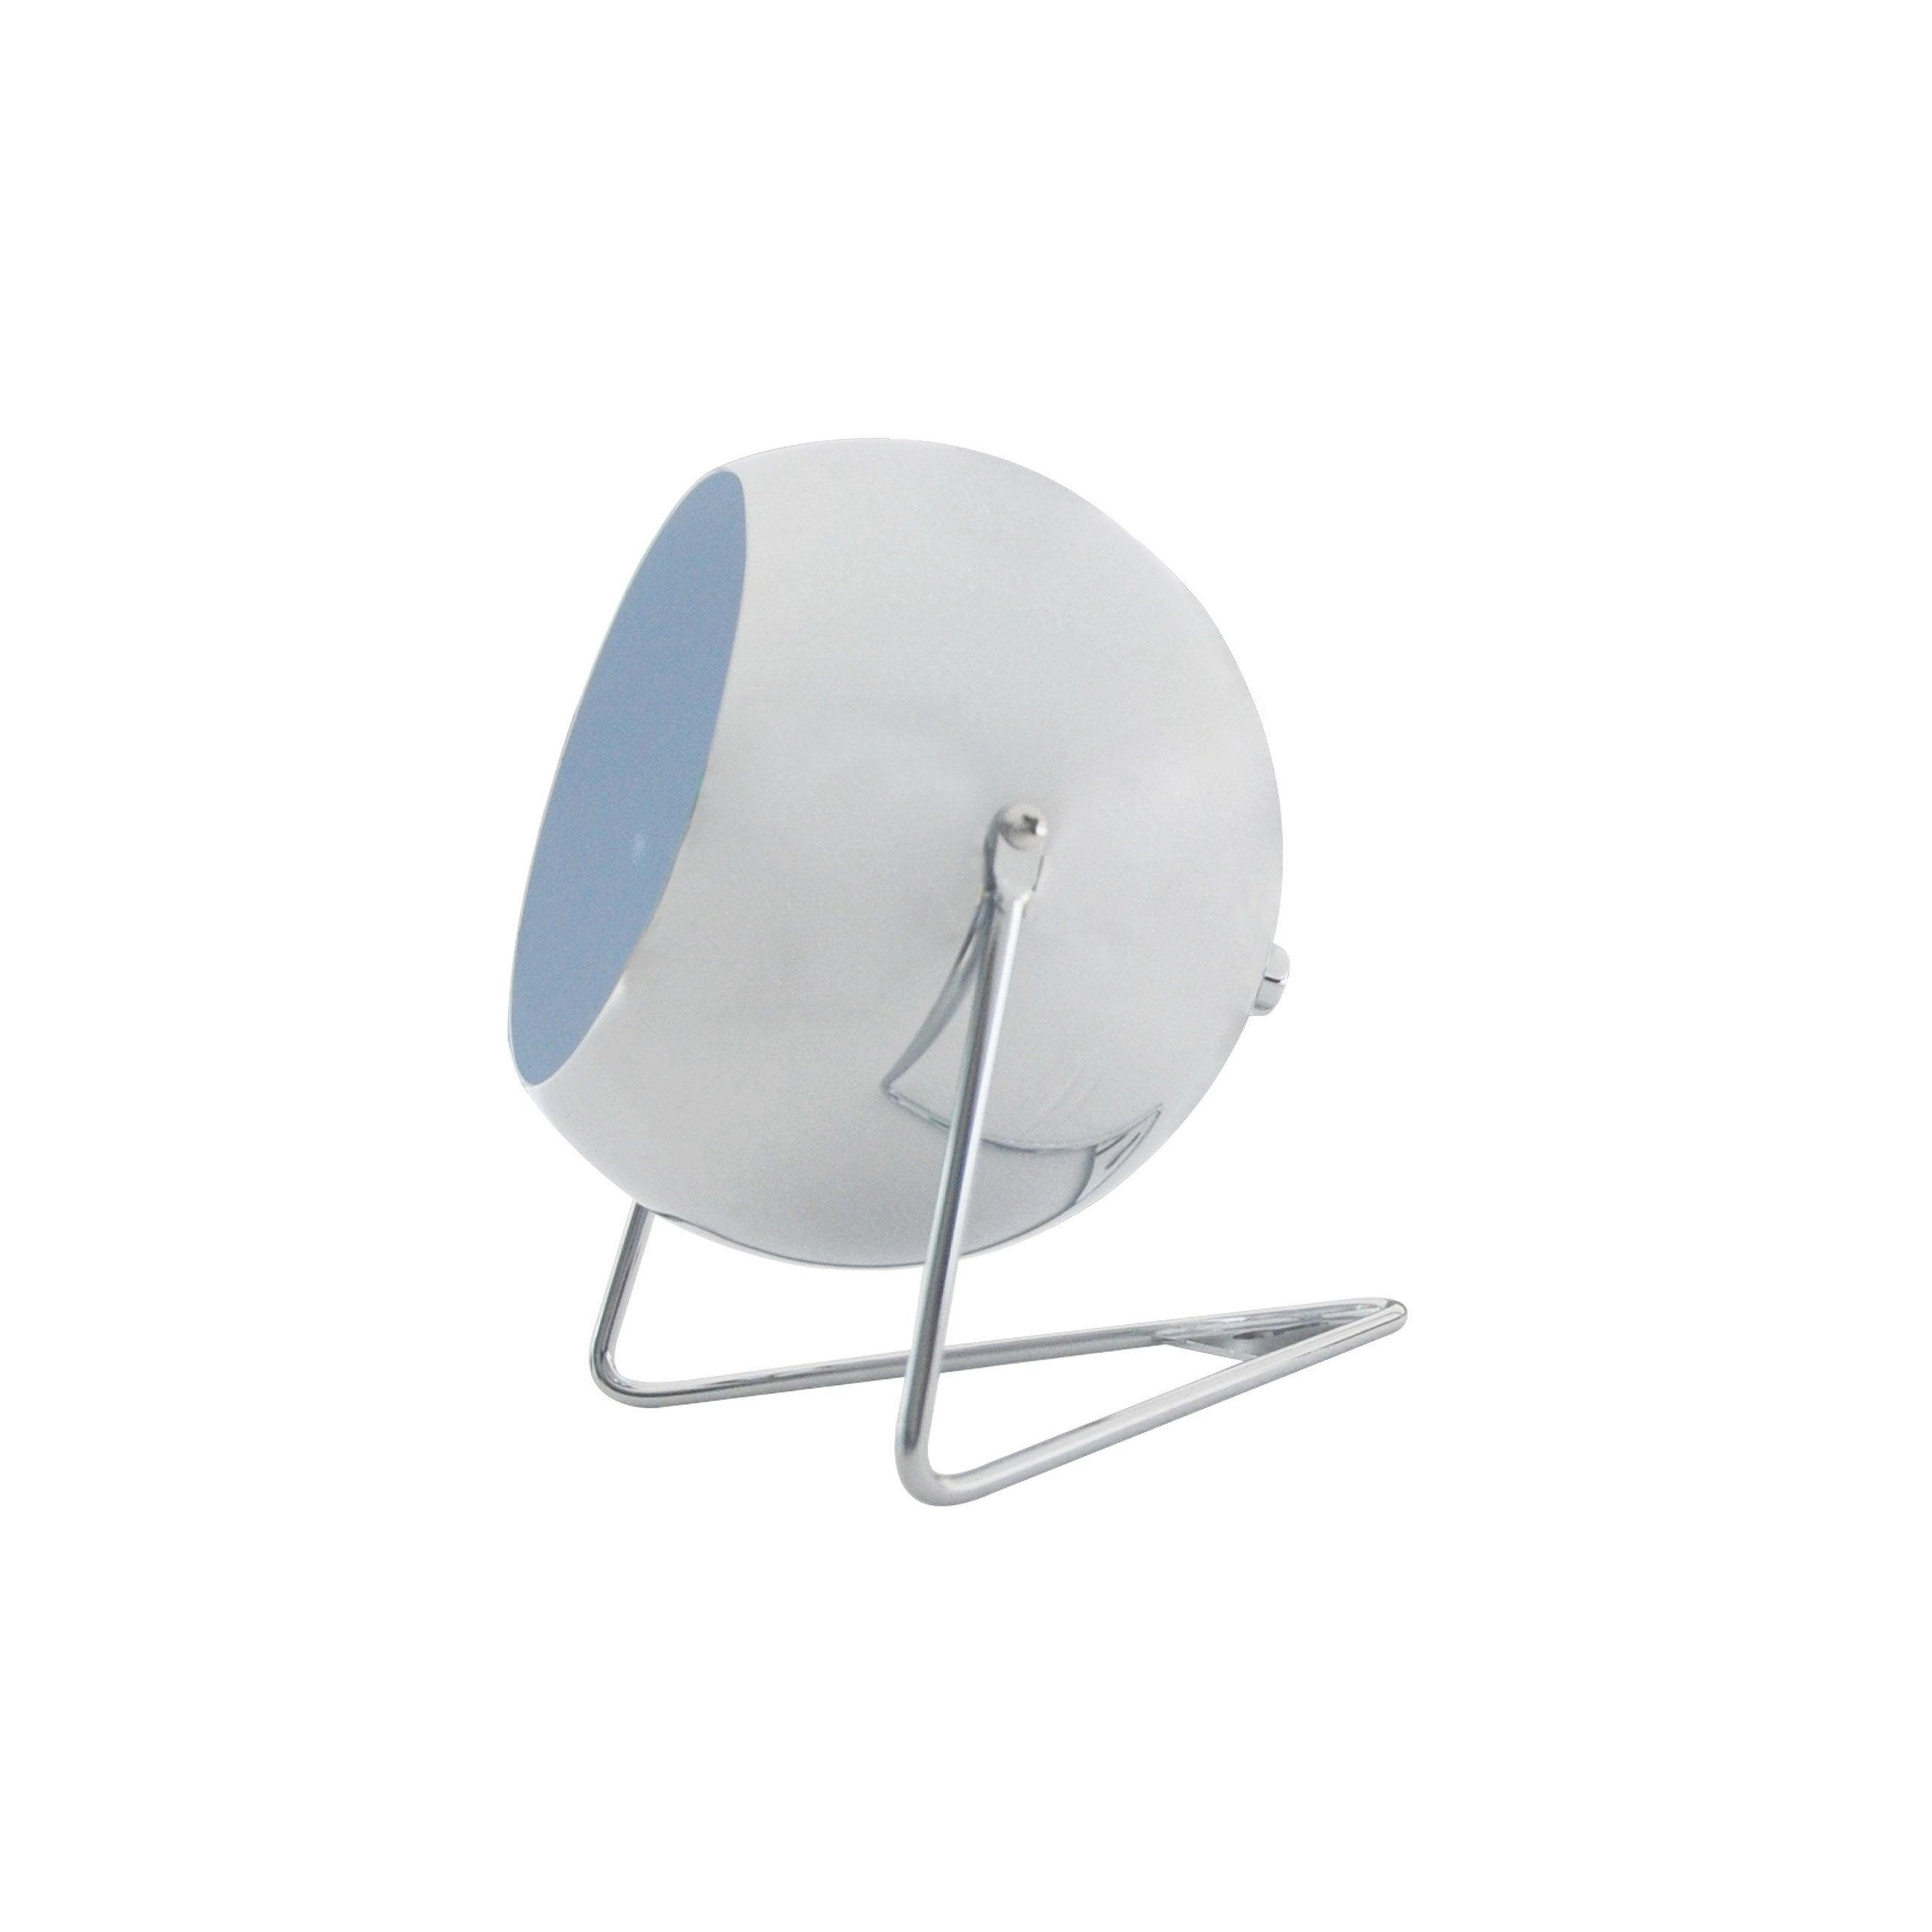 Lampe, essentiel, métal chromé mat, INSPIRE Bari